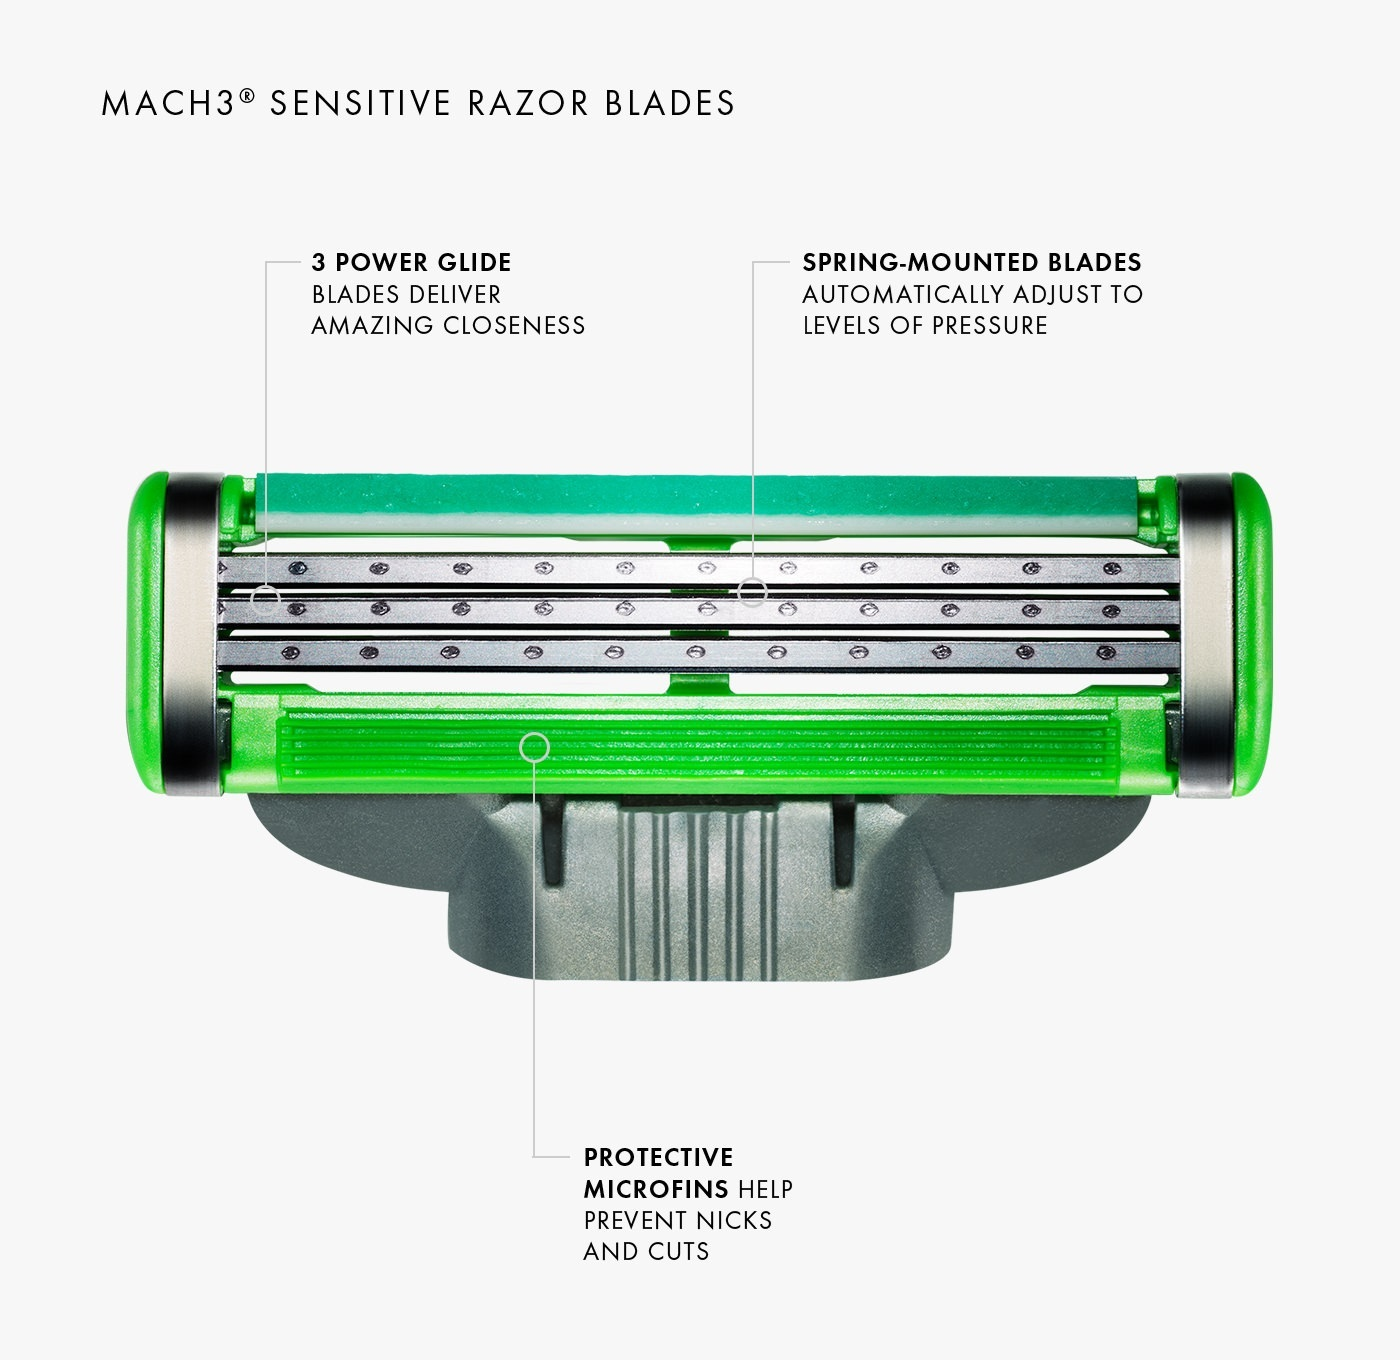 Gillette mach 3 razor blades coupons printable